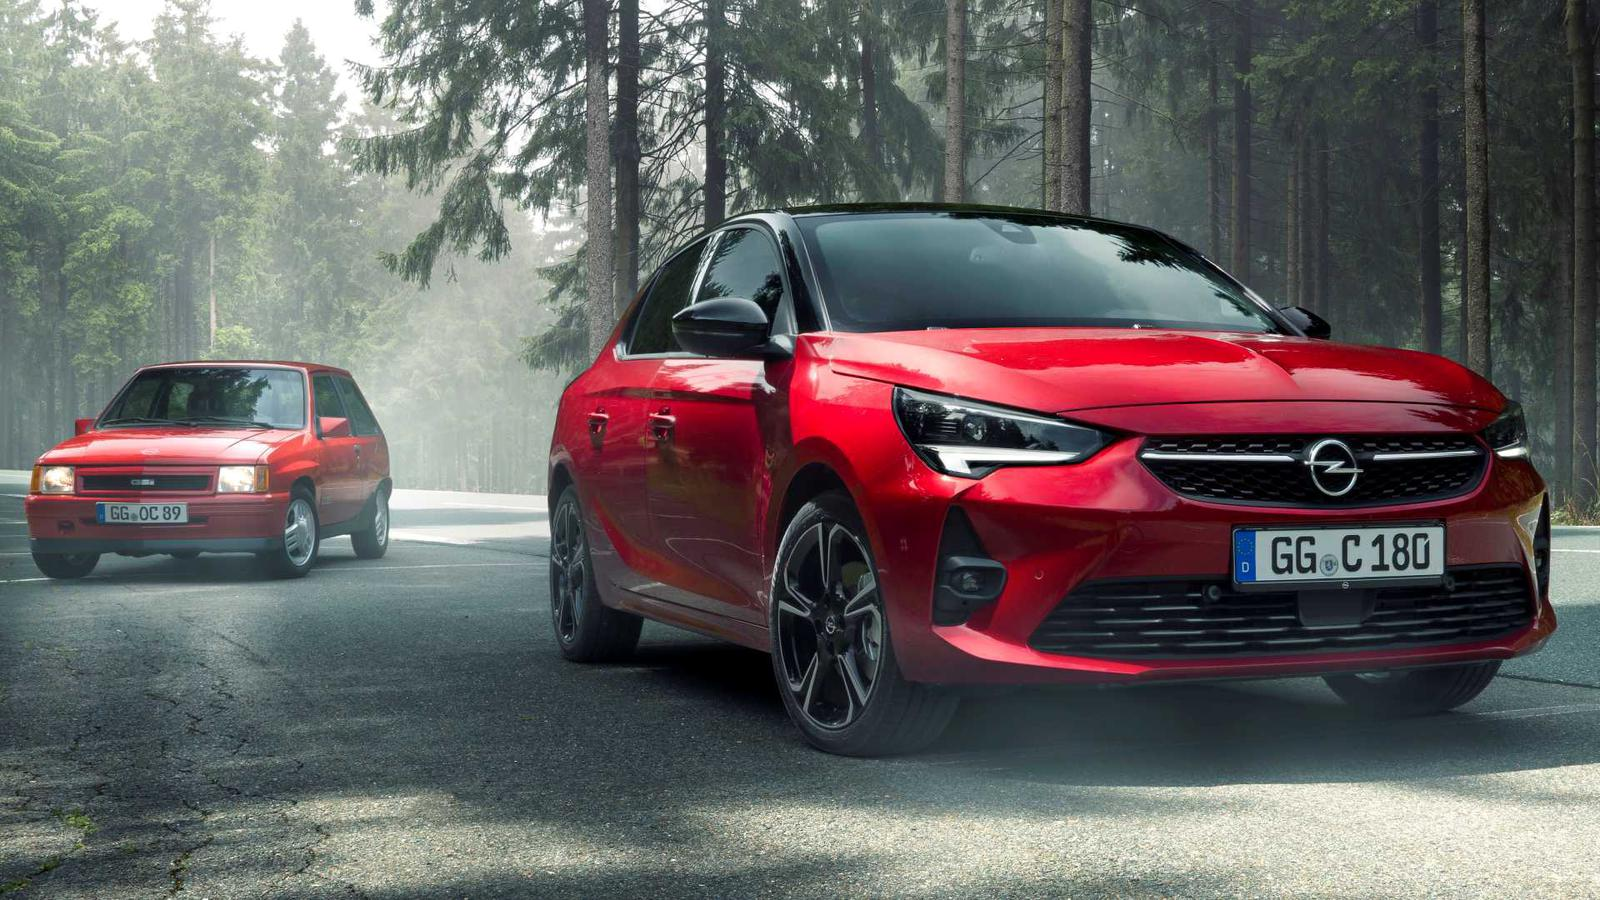 Opel Corsa GS Line vs Opel Corsa GSi (1)